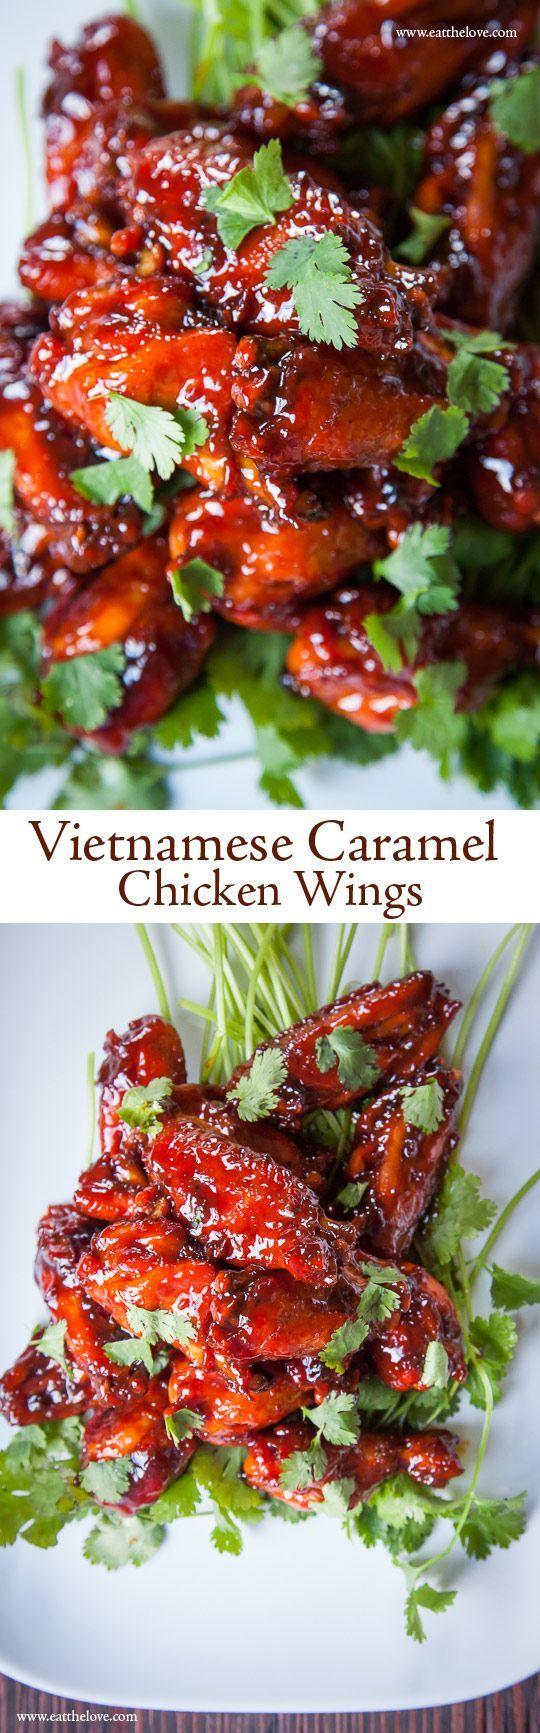 Vietnamese Caramel Chicken Wings | Eat The Love